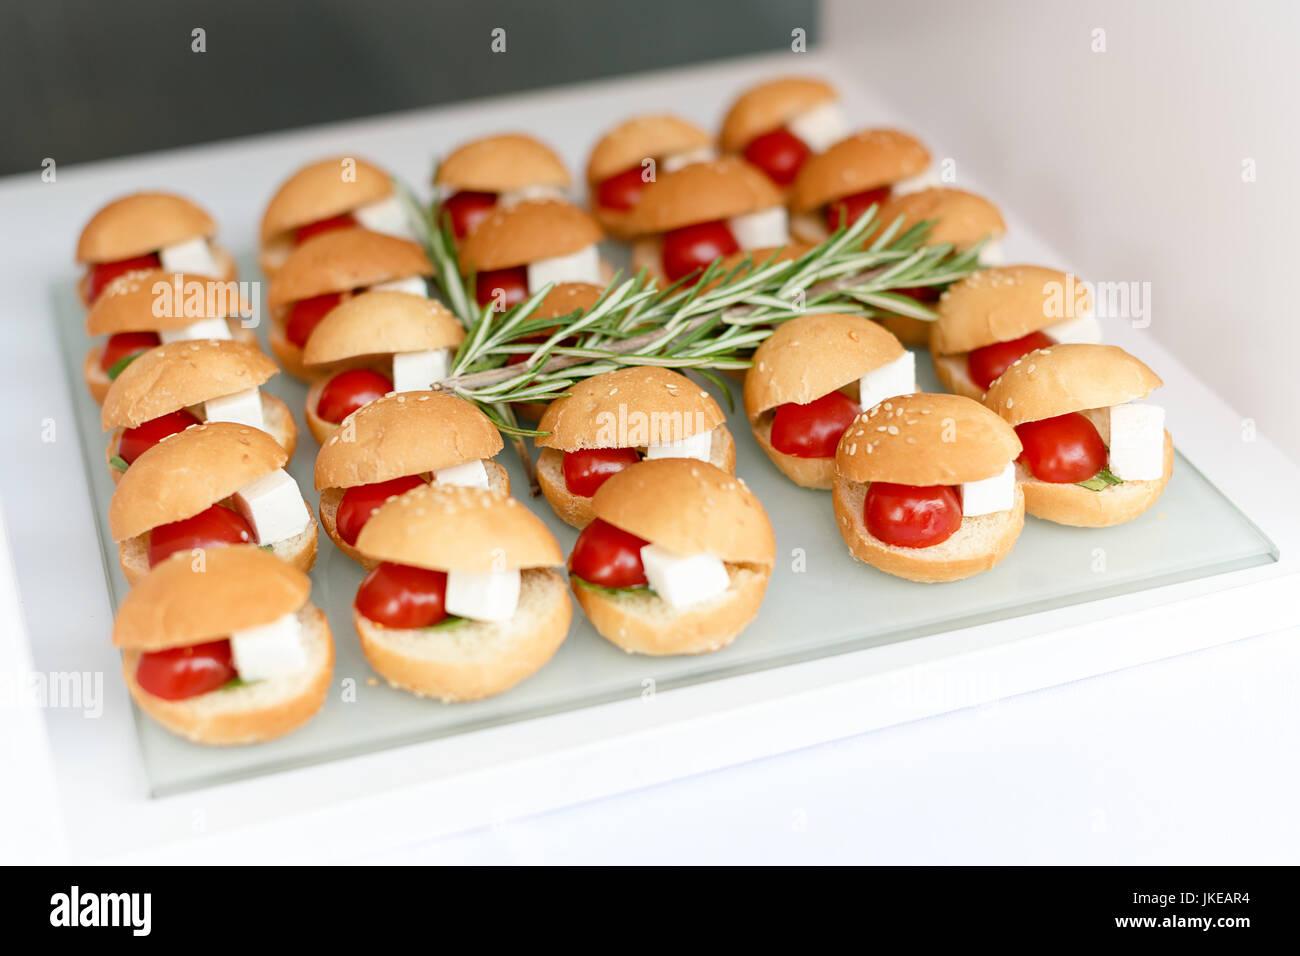 mini hamburger fingerfood mini burger party essen schieberegler stockfoto bild 149677224. Black Bedroom Furniture Sets. Home Design Ideas